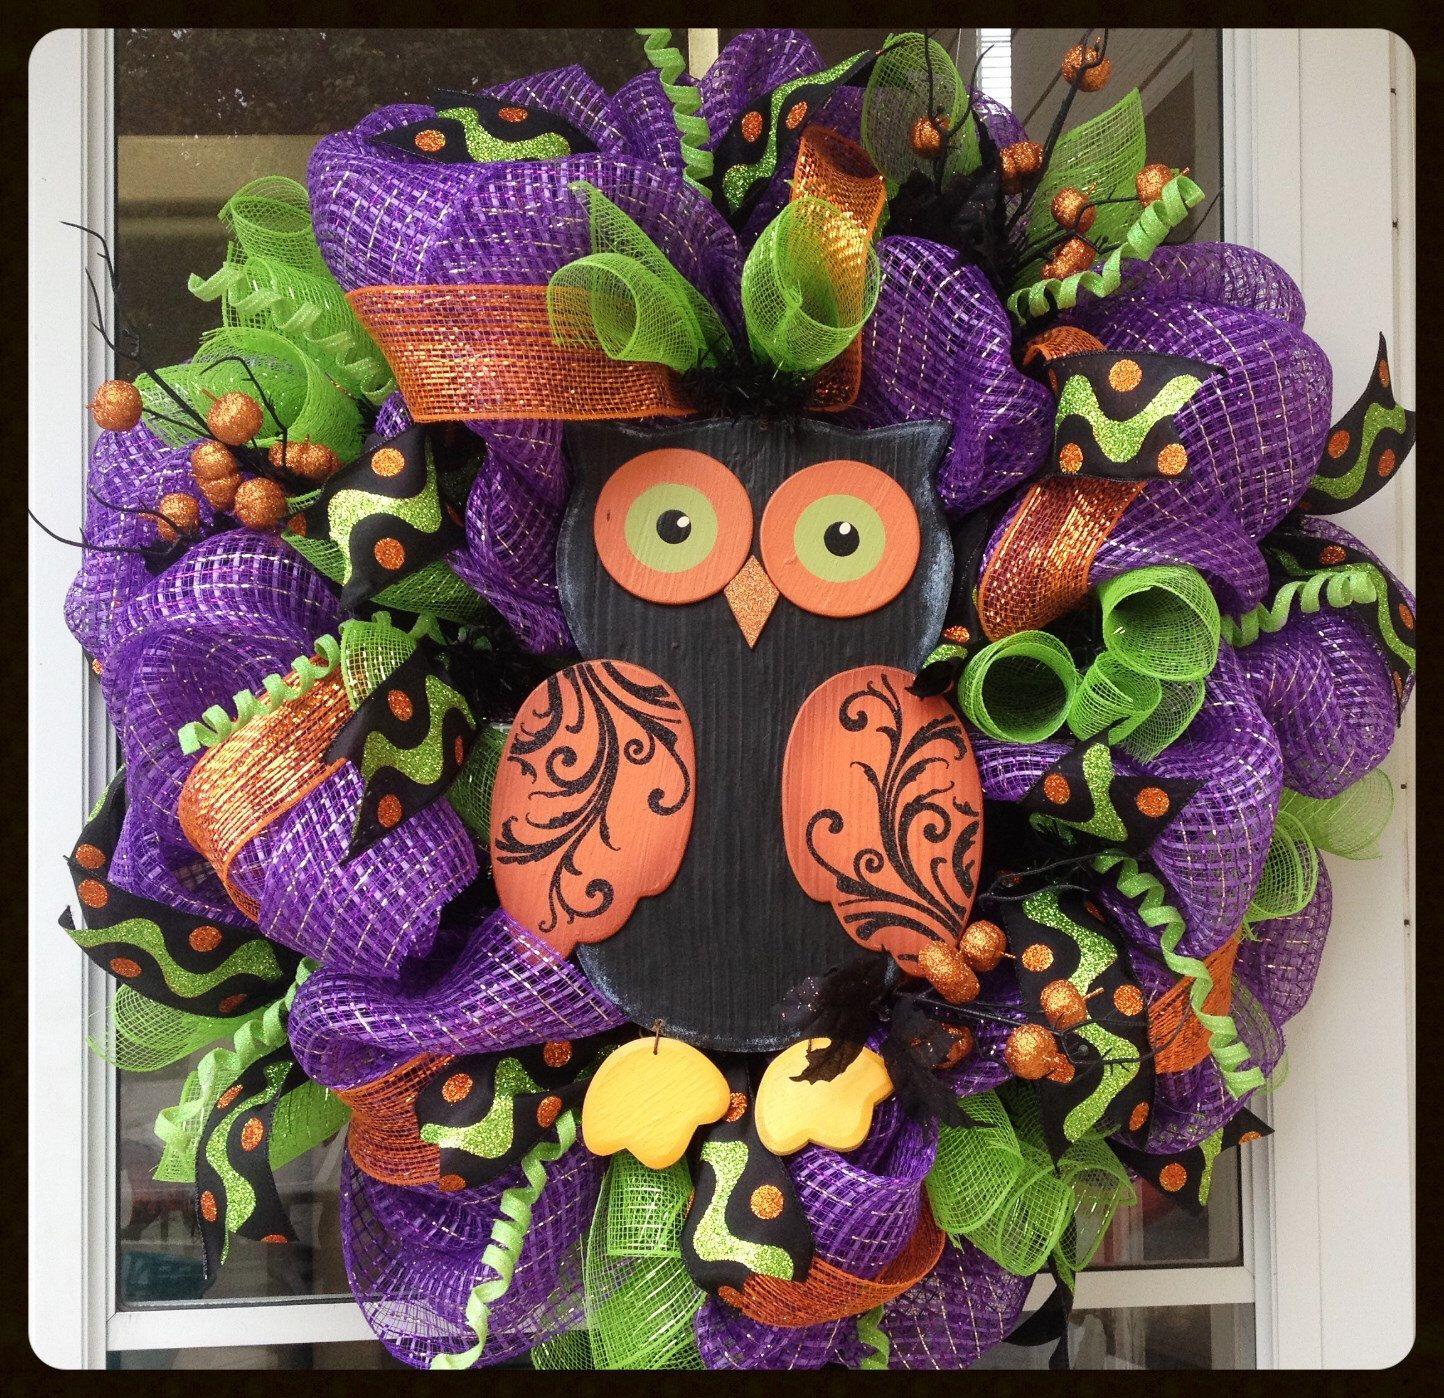 Fun and Whimsical Owl Halloween Wreath - Purple Orange Green Halloween Wreath - Halloween Decoration - Halloween Door Decor - Fall Wreath by StephsDoorDecor on Etsy https://www.etsy.com/listing/205131083/fun-and-whimsical-owl-halloween-wreath